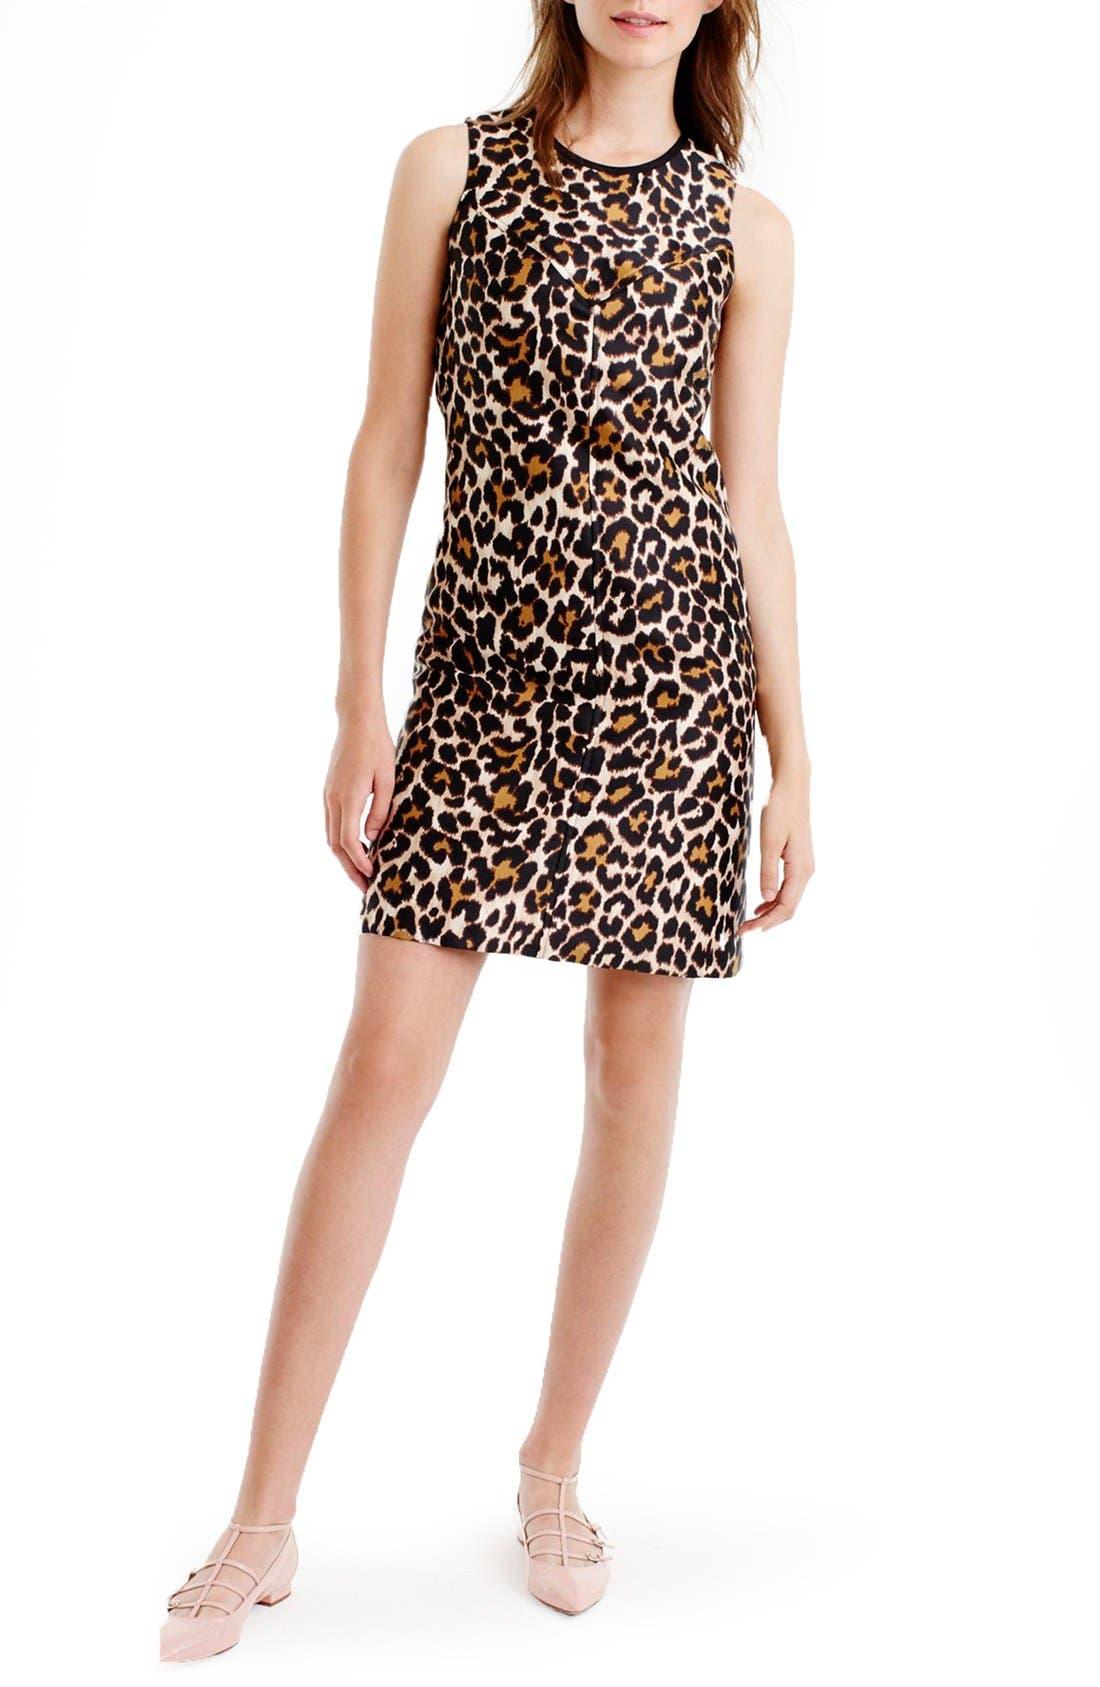 Main Image - J.Crew Leopard Print Shift Dress (Regular & Petite)